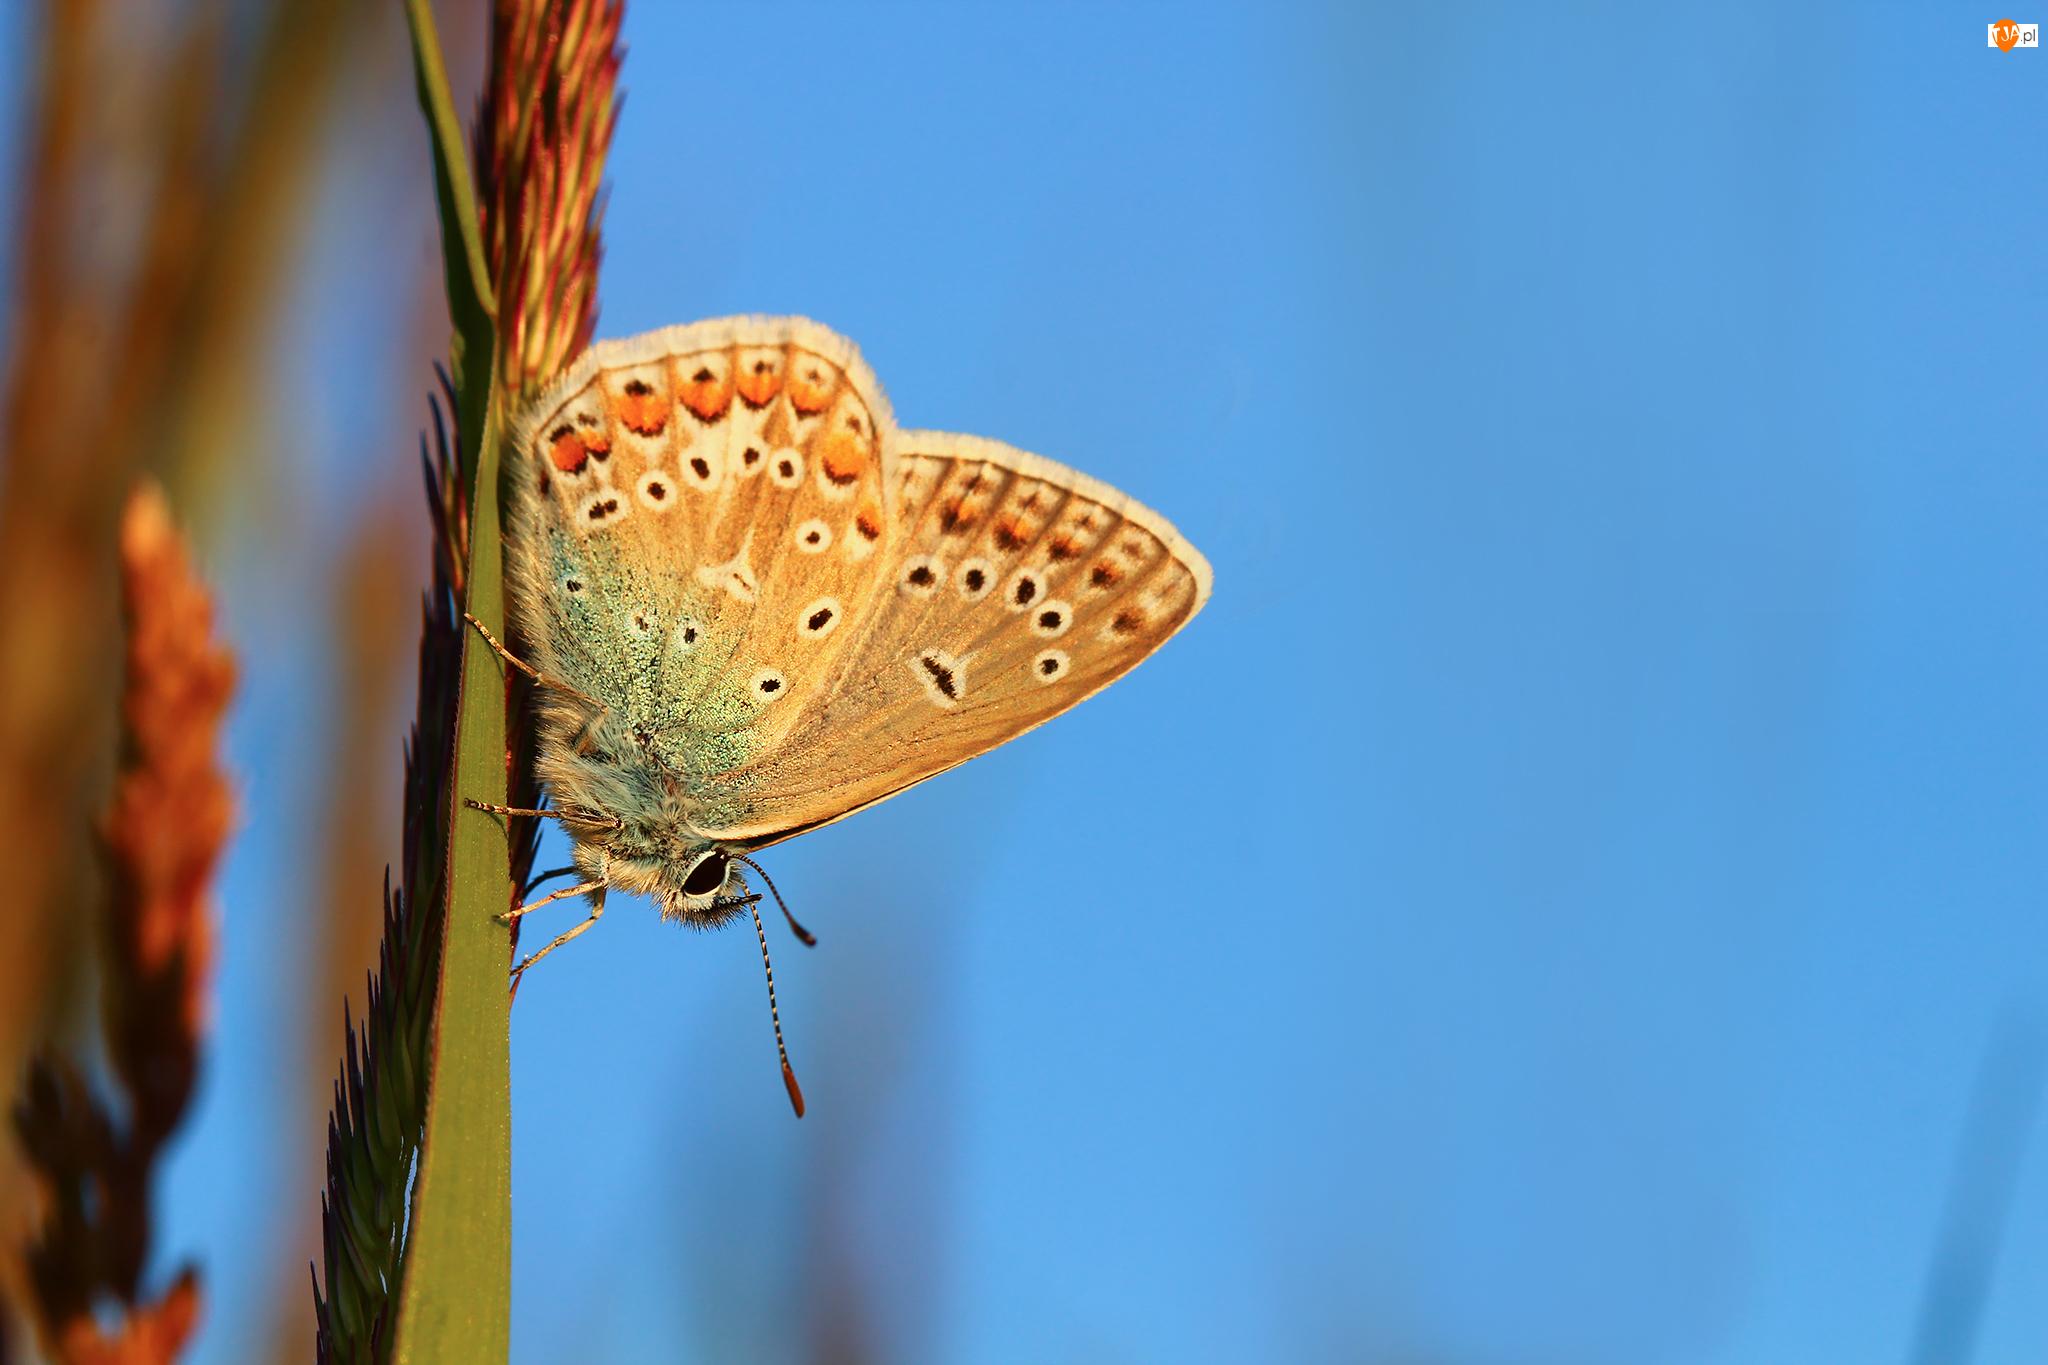 Motyl, Modraszek adonis